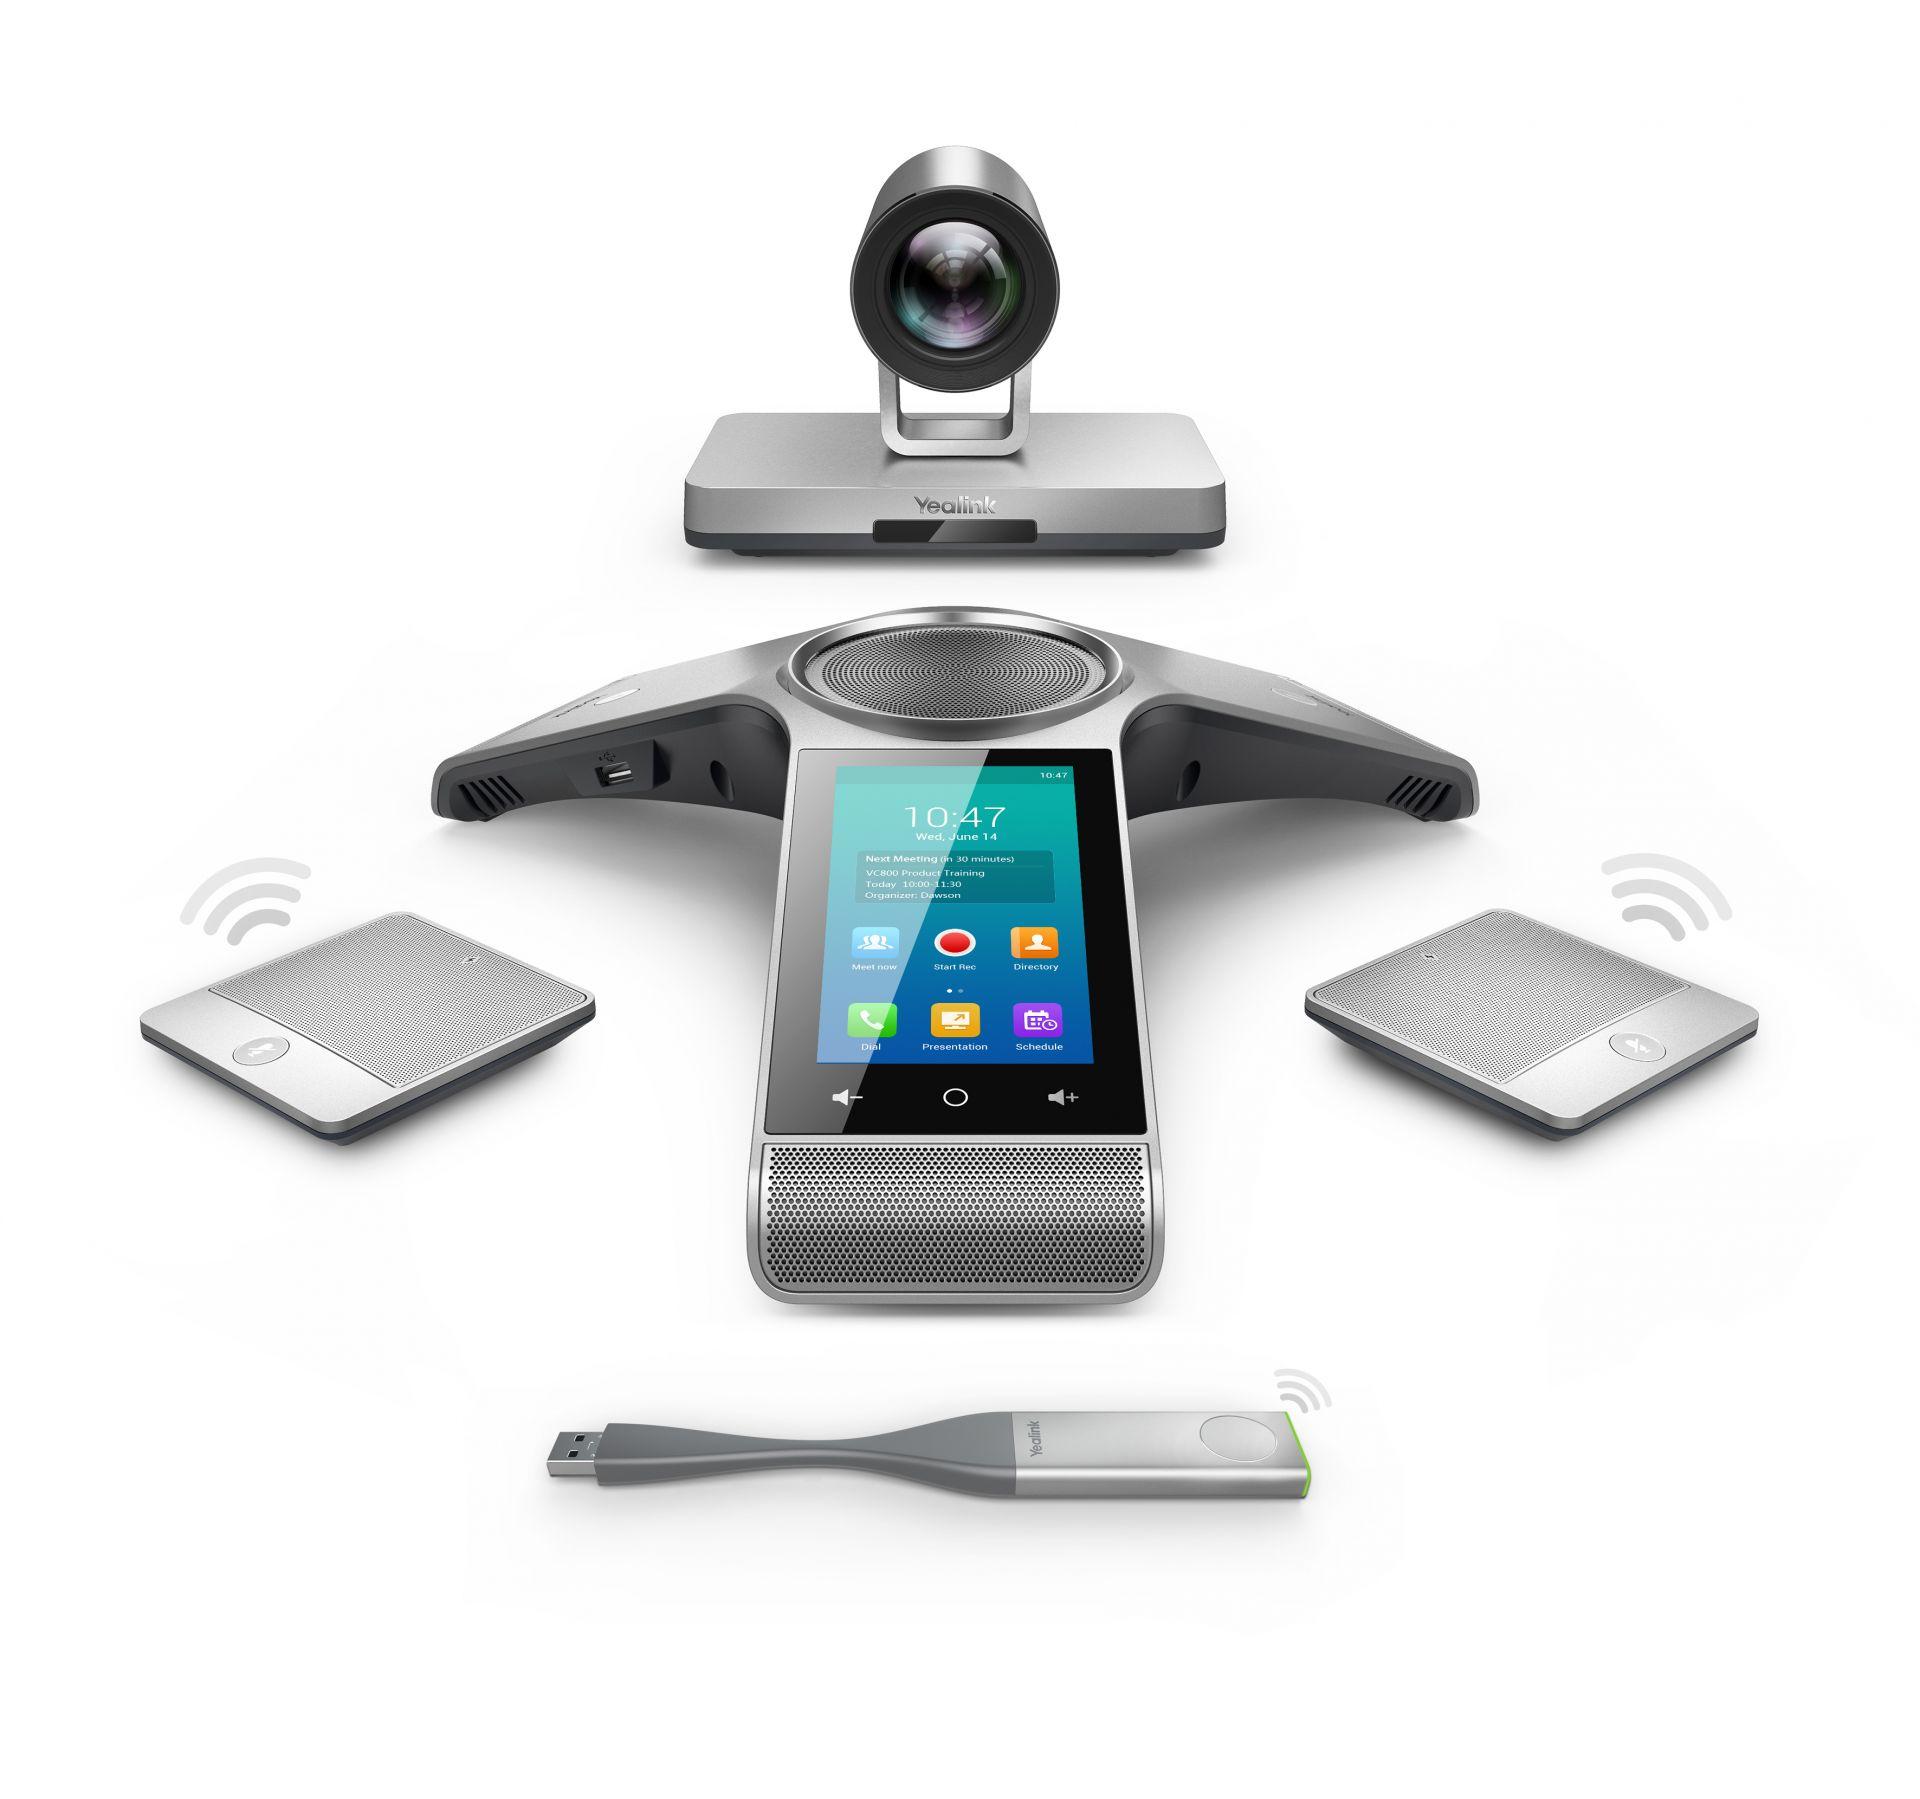 Yealink VC800 Video Konferenzsystem wireless + WPP